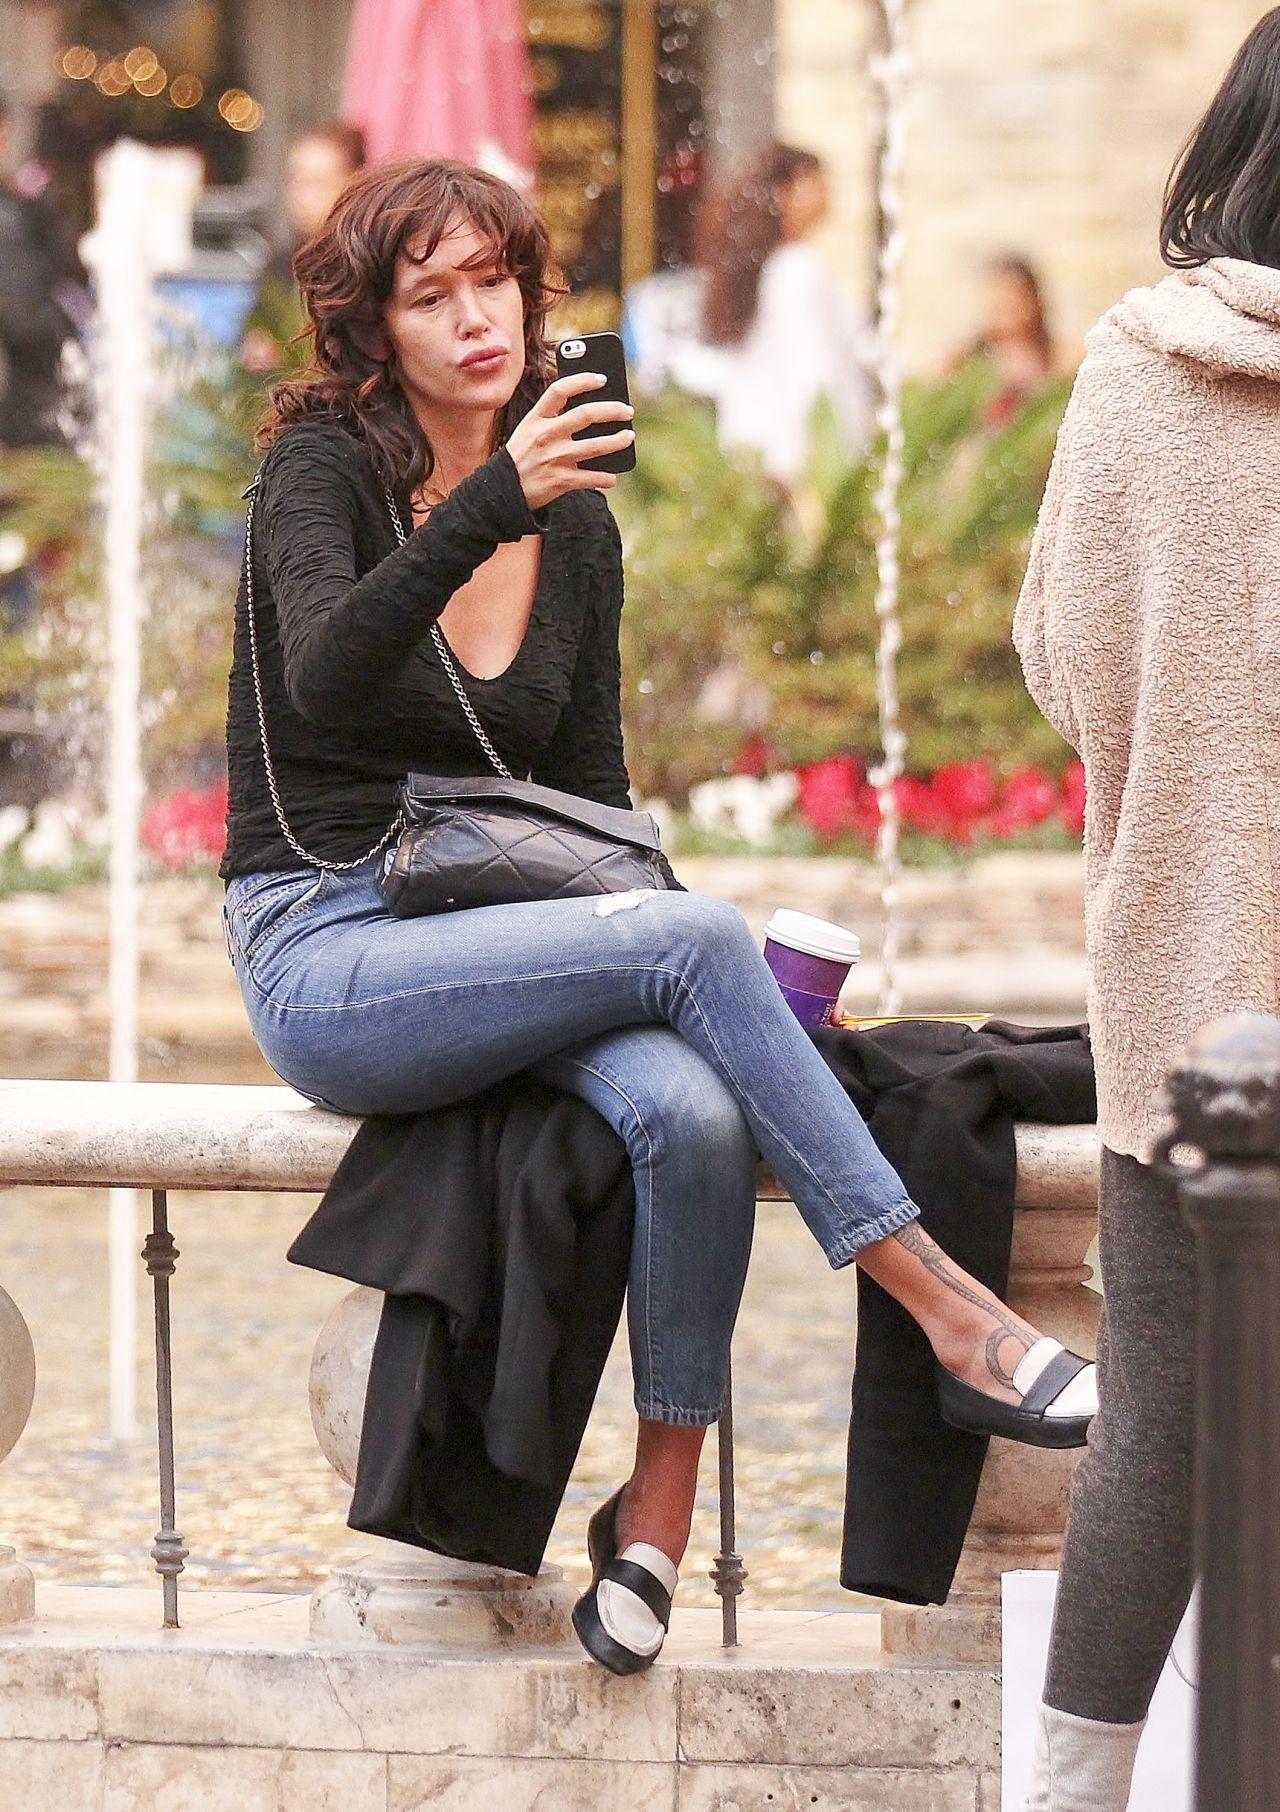 Paz de la Huerta - Takes a Selfie While Out Shopping in ...